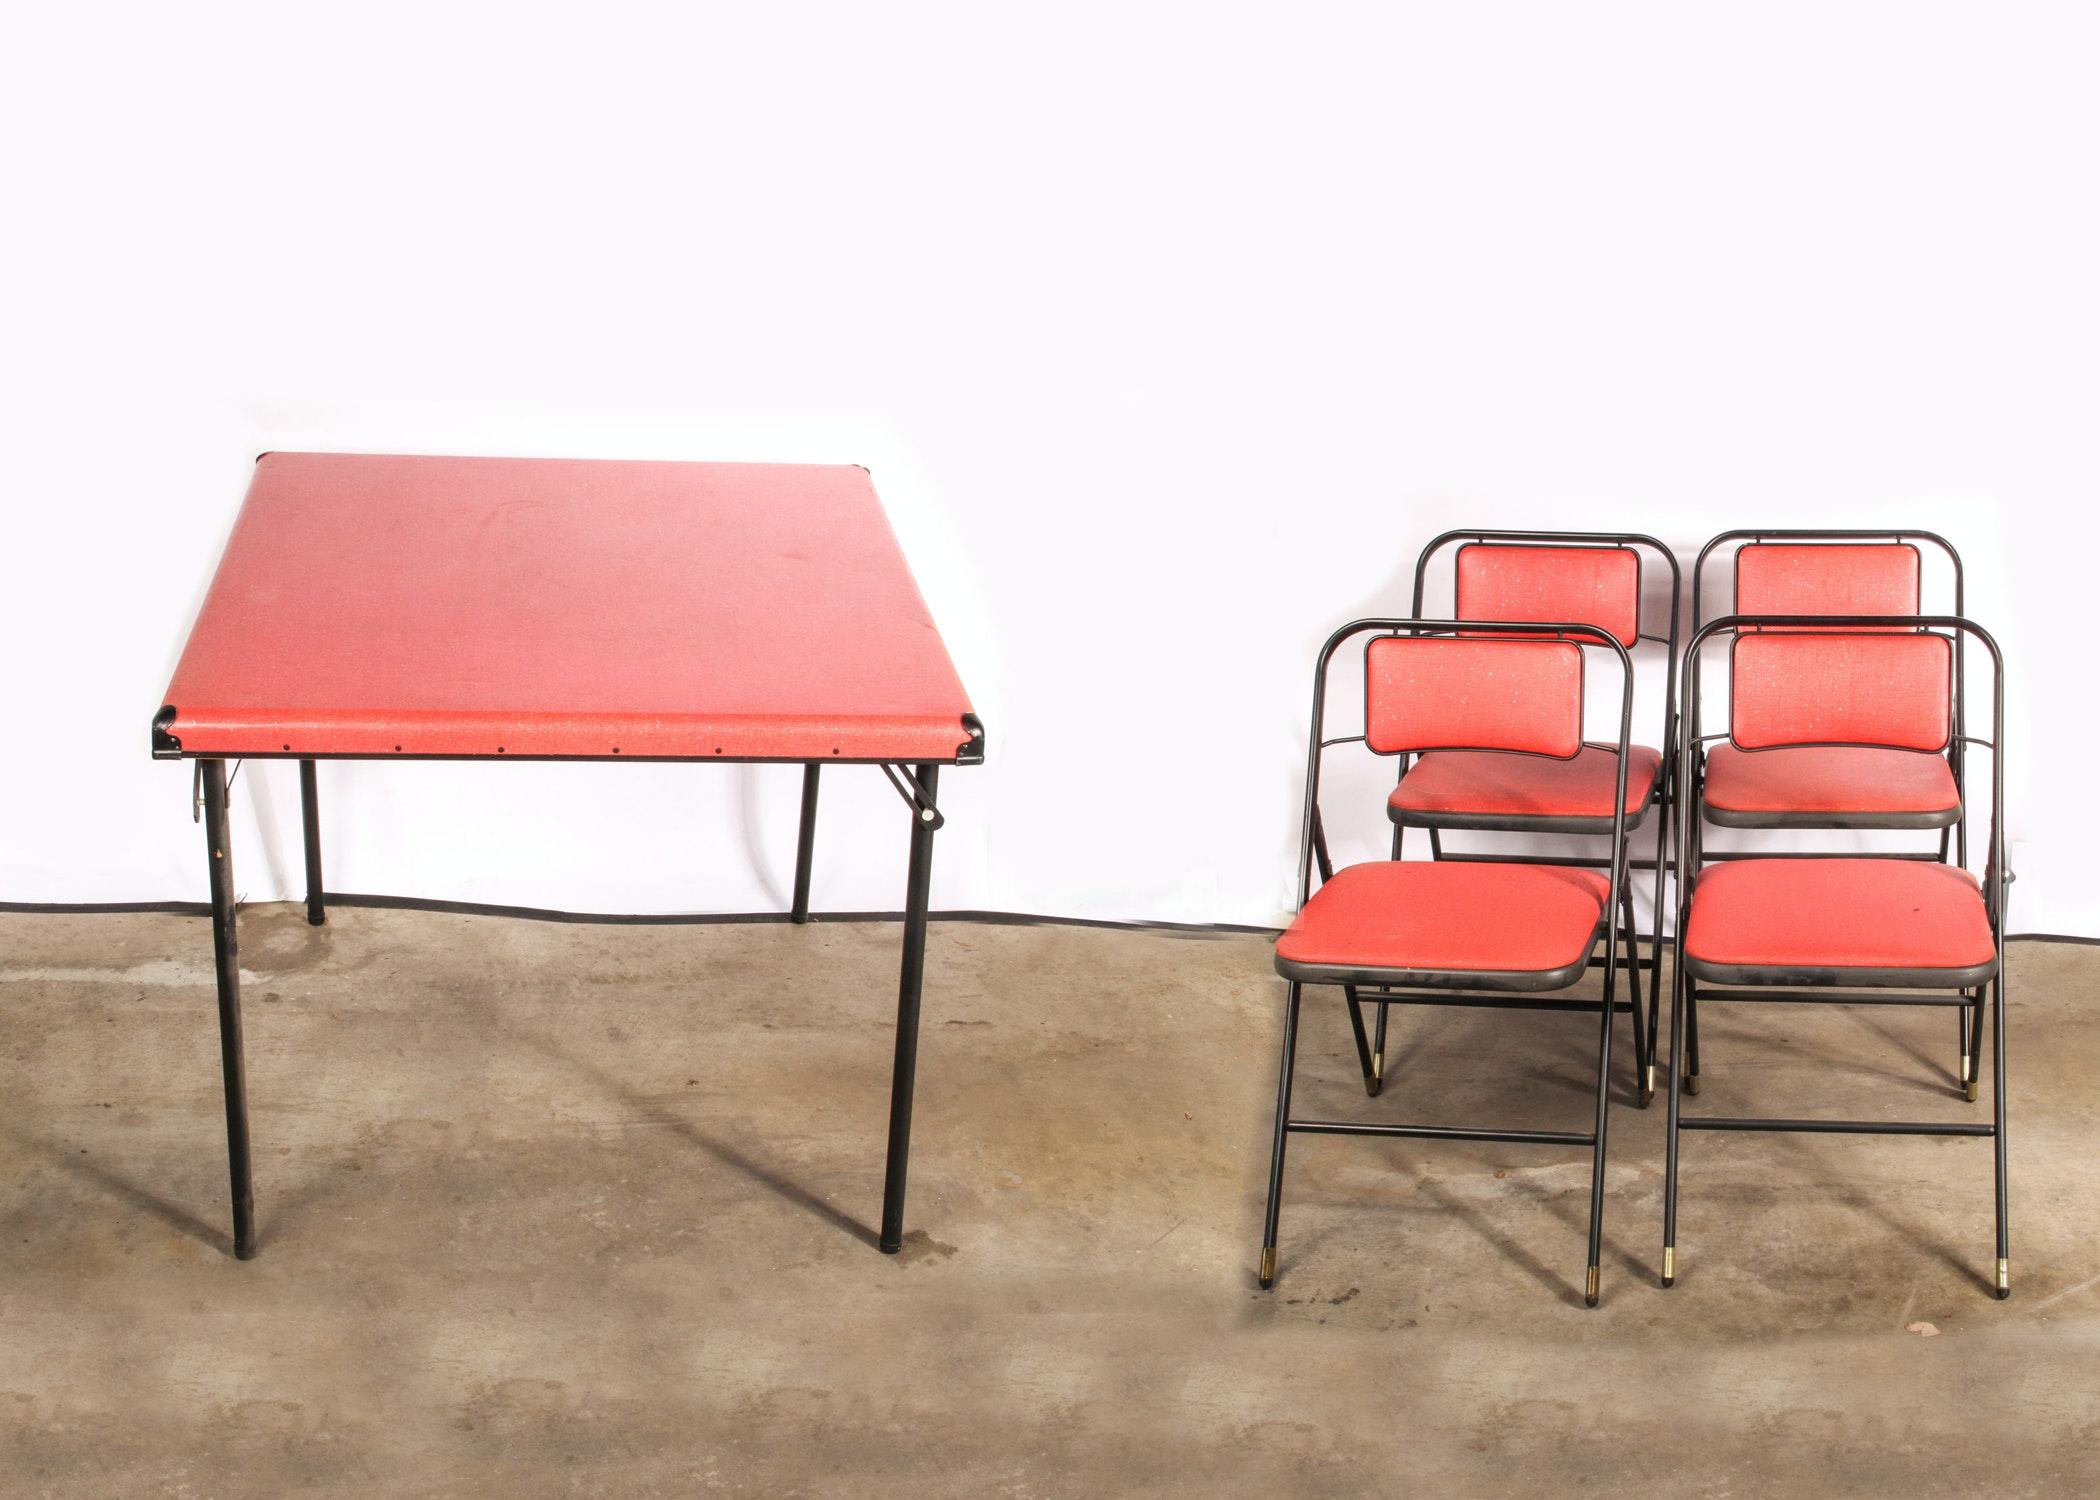 Vintage Shwayder Bros Samsonite Table and Folding Chairs EBTH